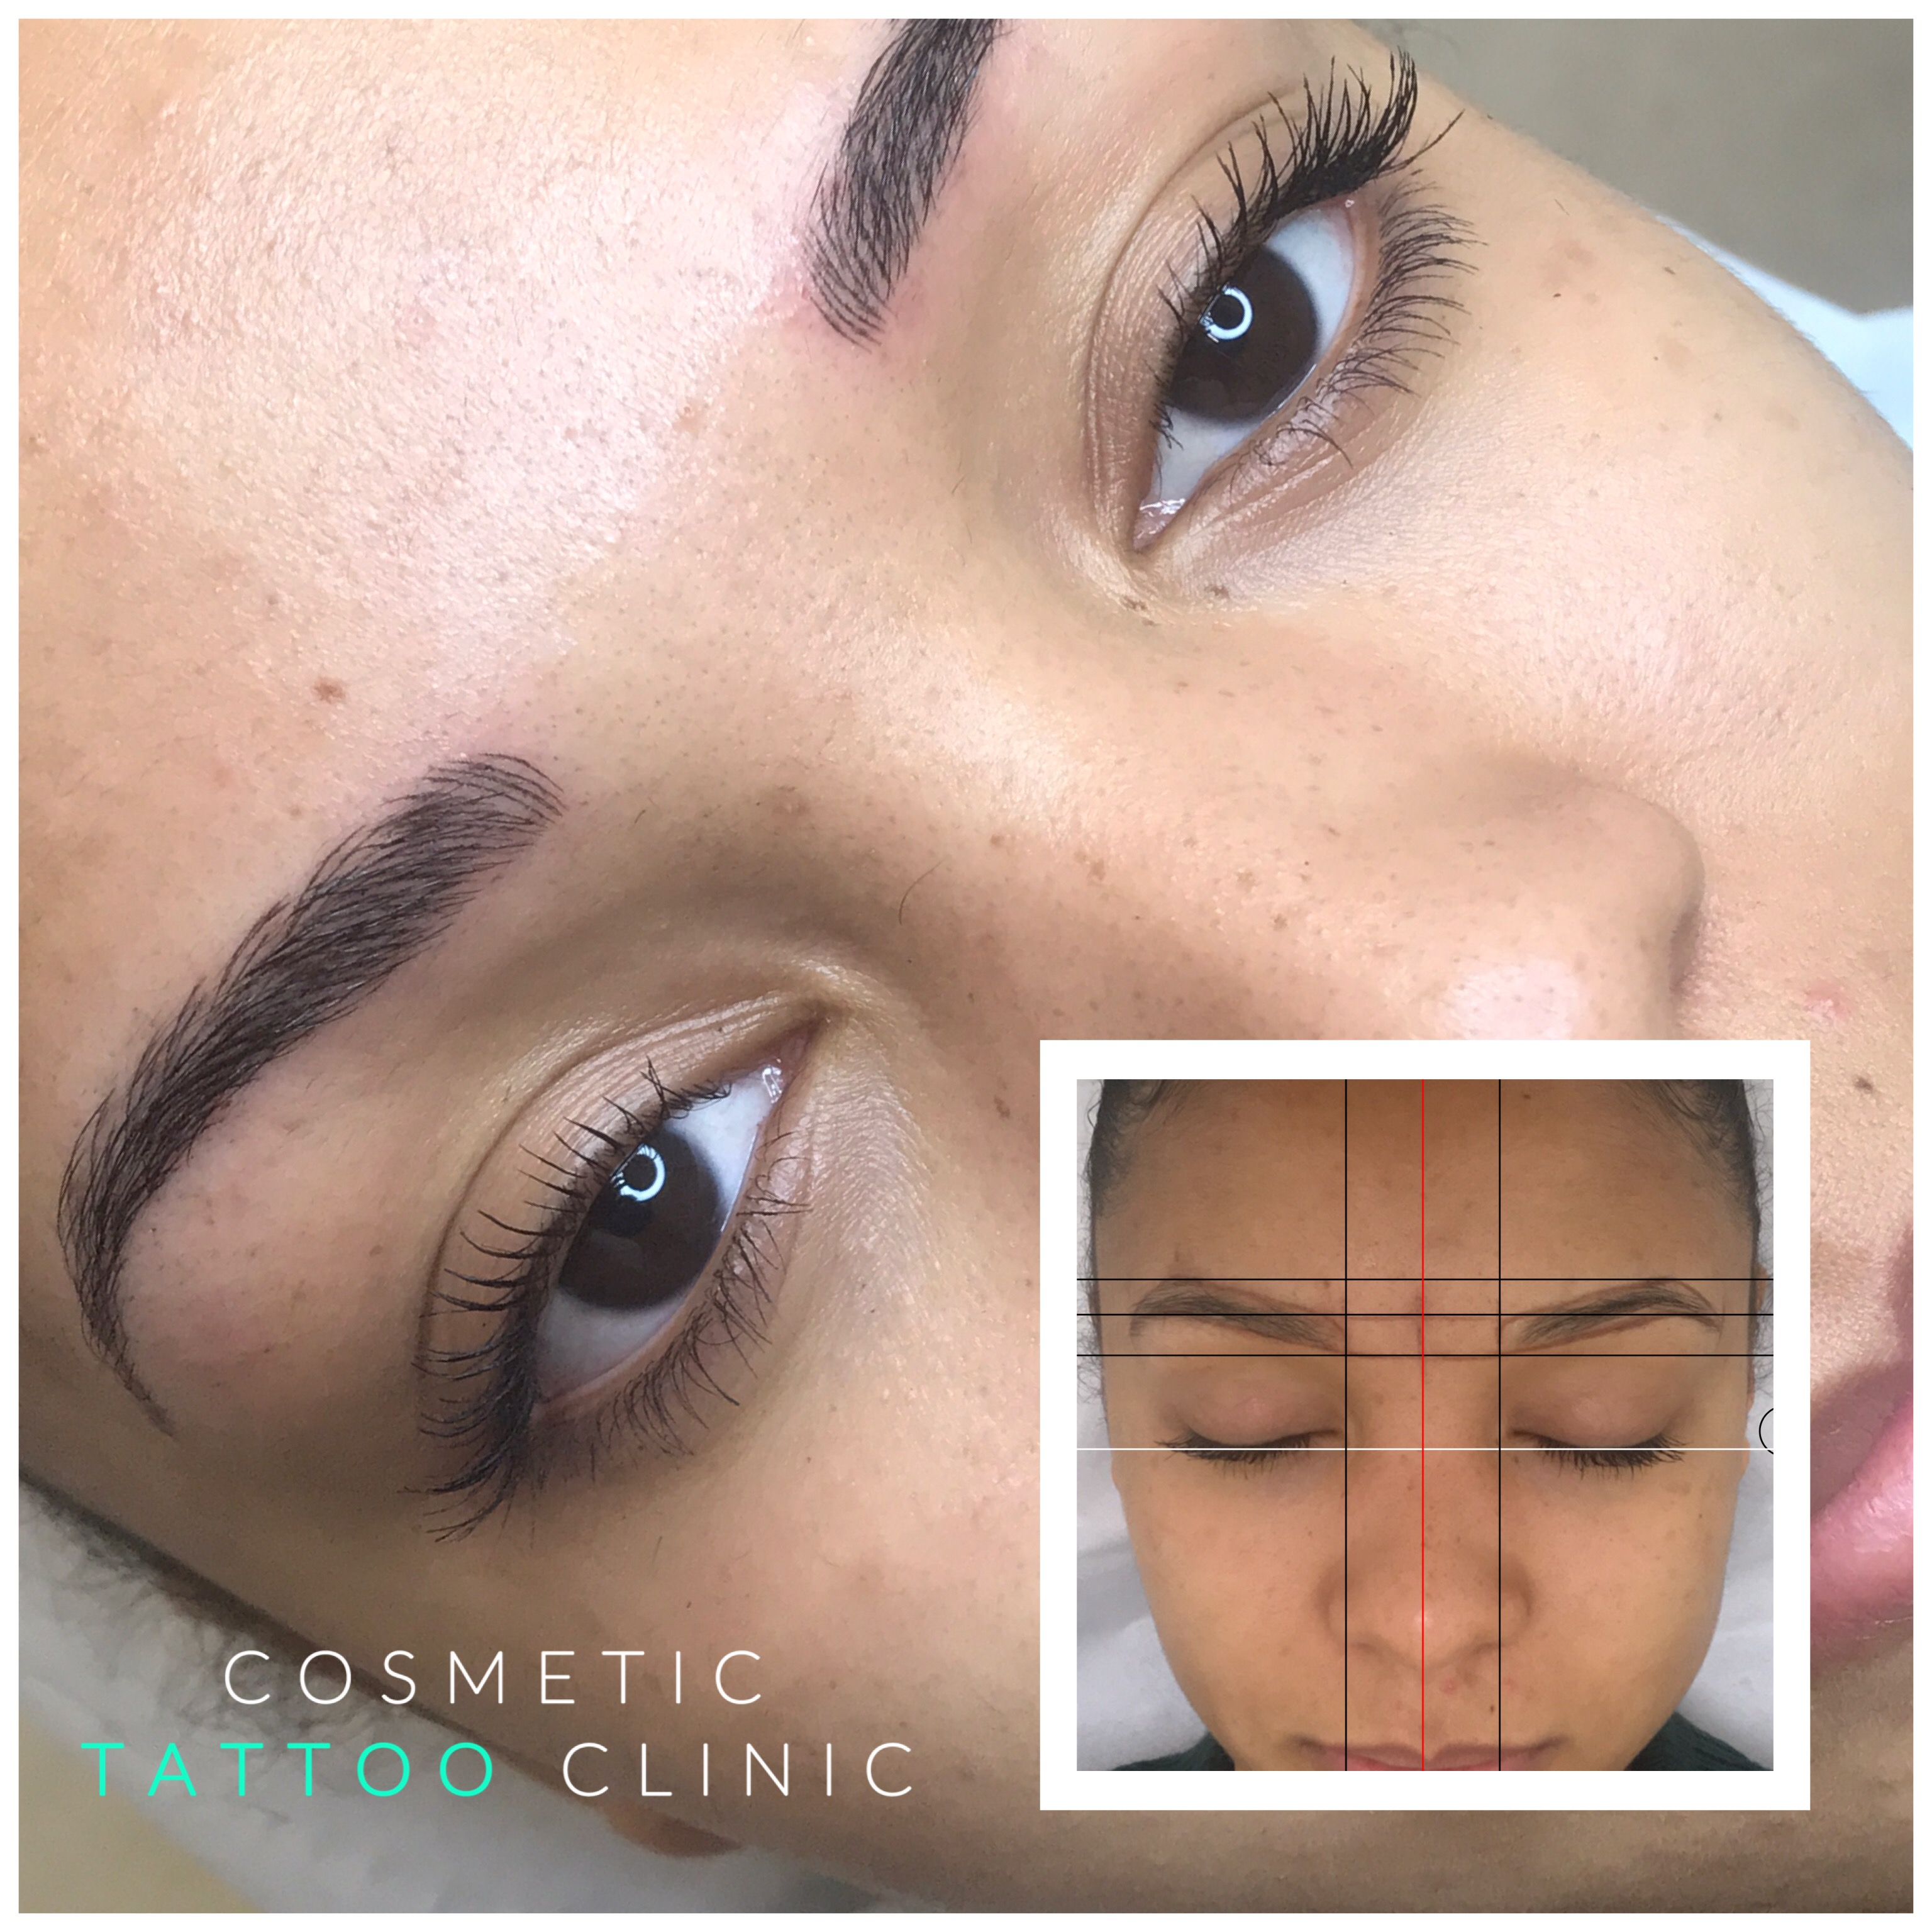 Cosmetic Tattoo Clinic